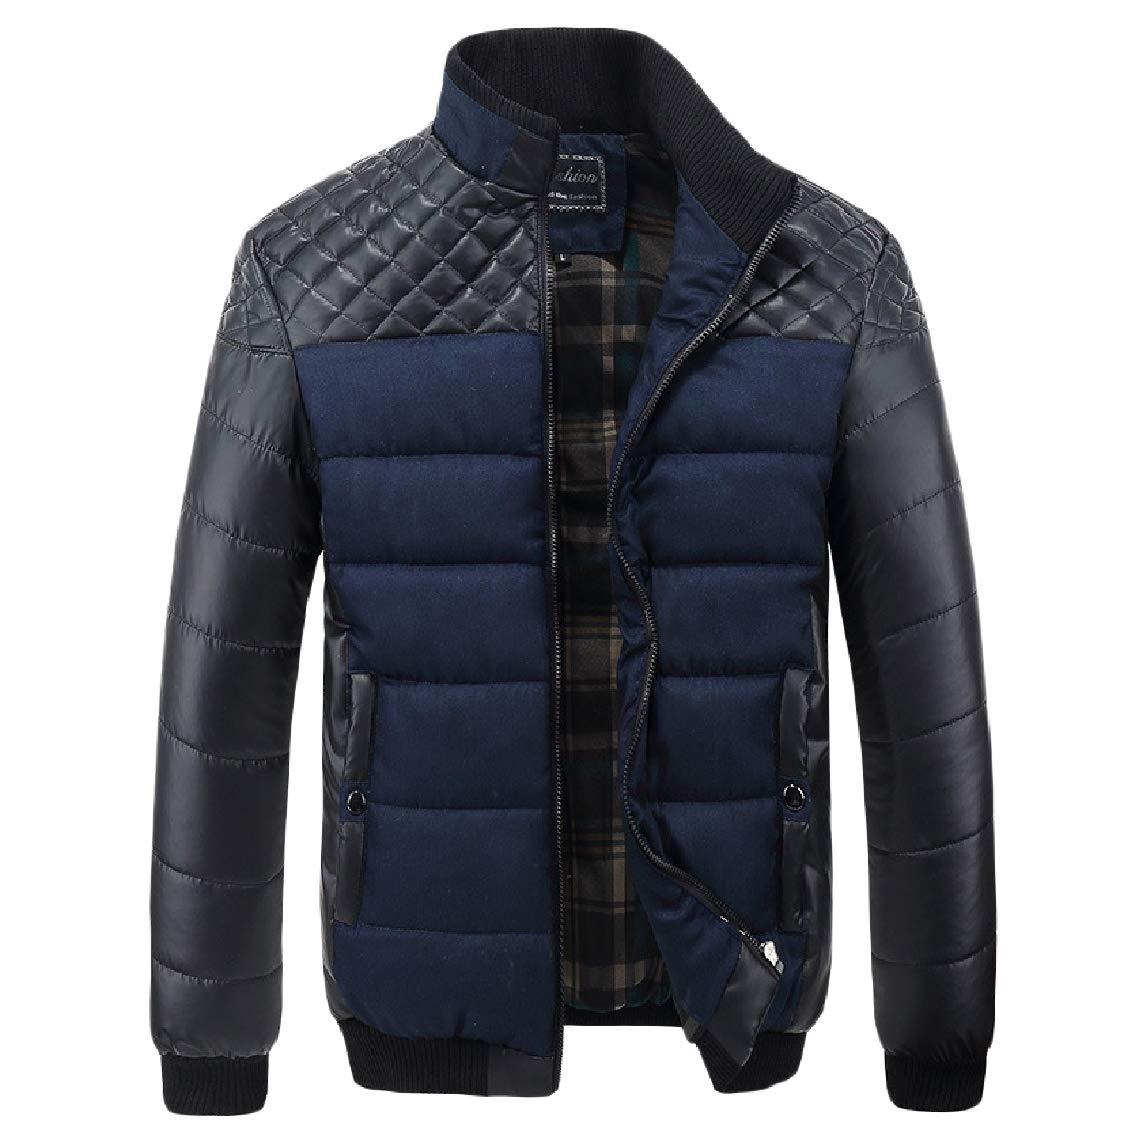 FreelyMen Pocket Stand Collar Thickened Cotton Zipper Splice Warm Outwear Coat